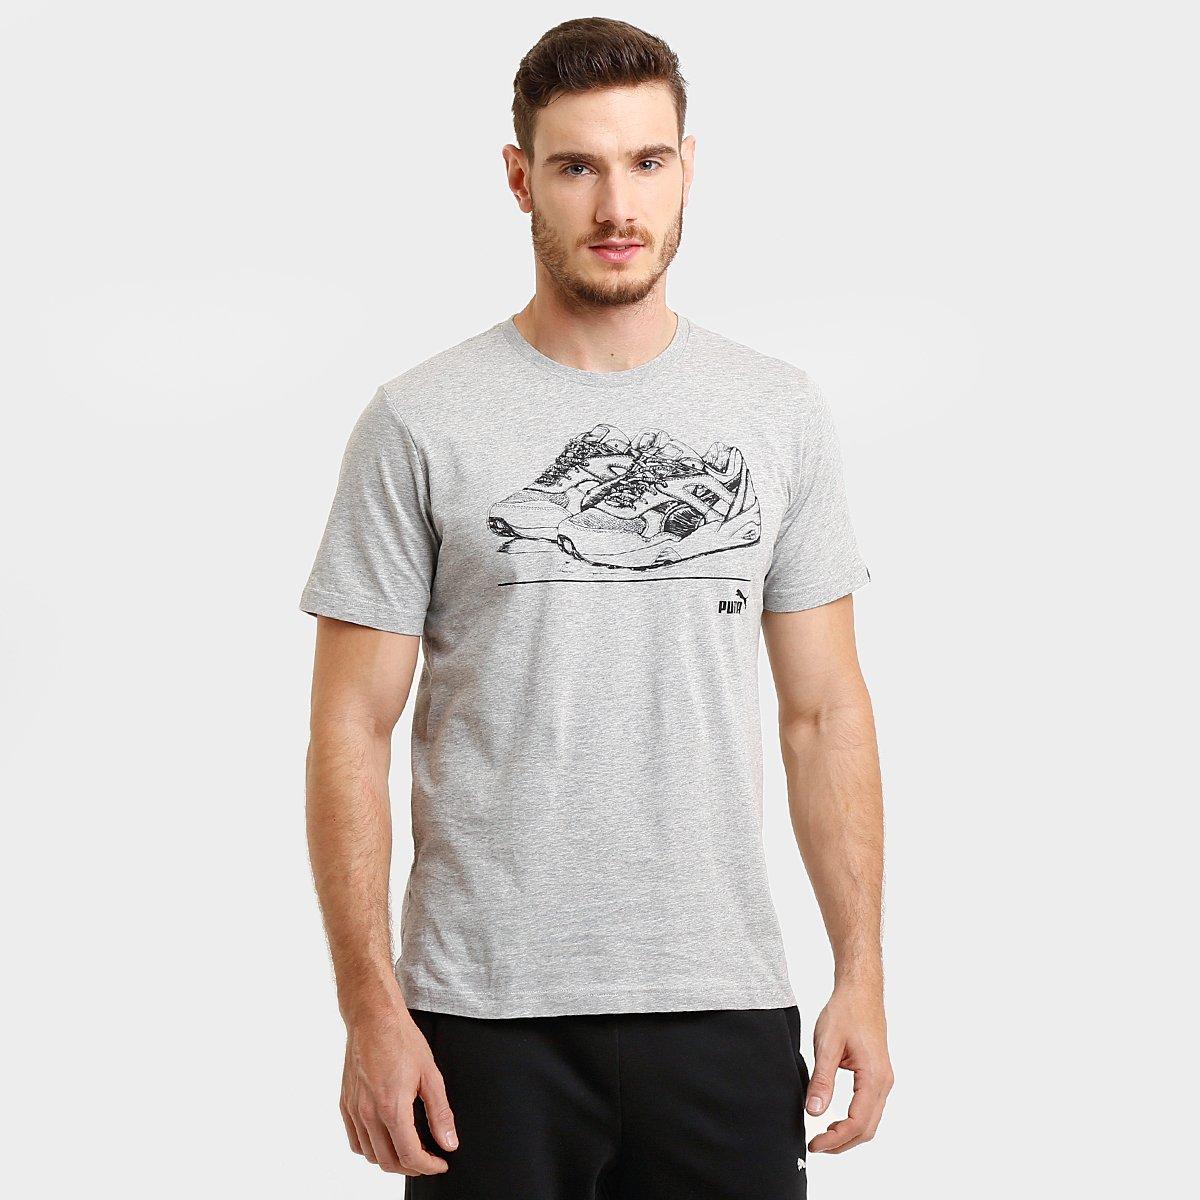 9a9d1dee40 Camiseta Puma Handdrawn Tee - Compre Agora